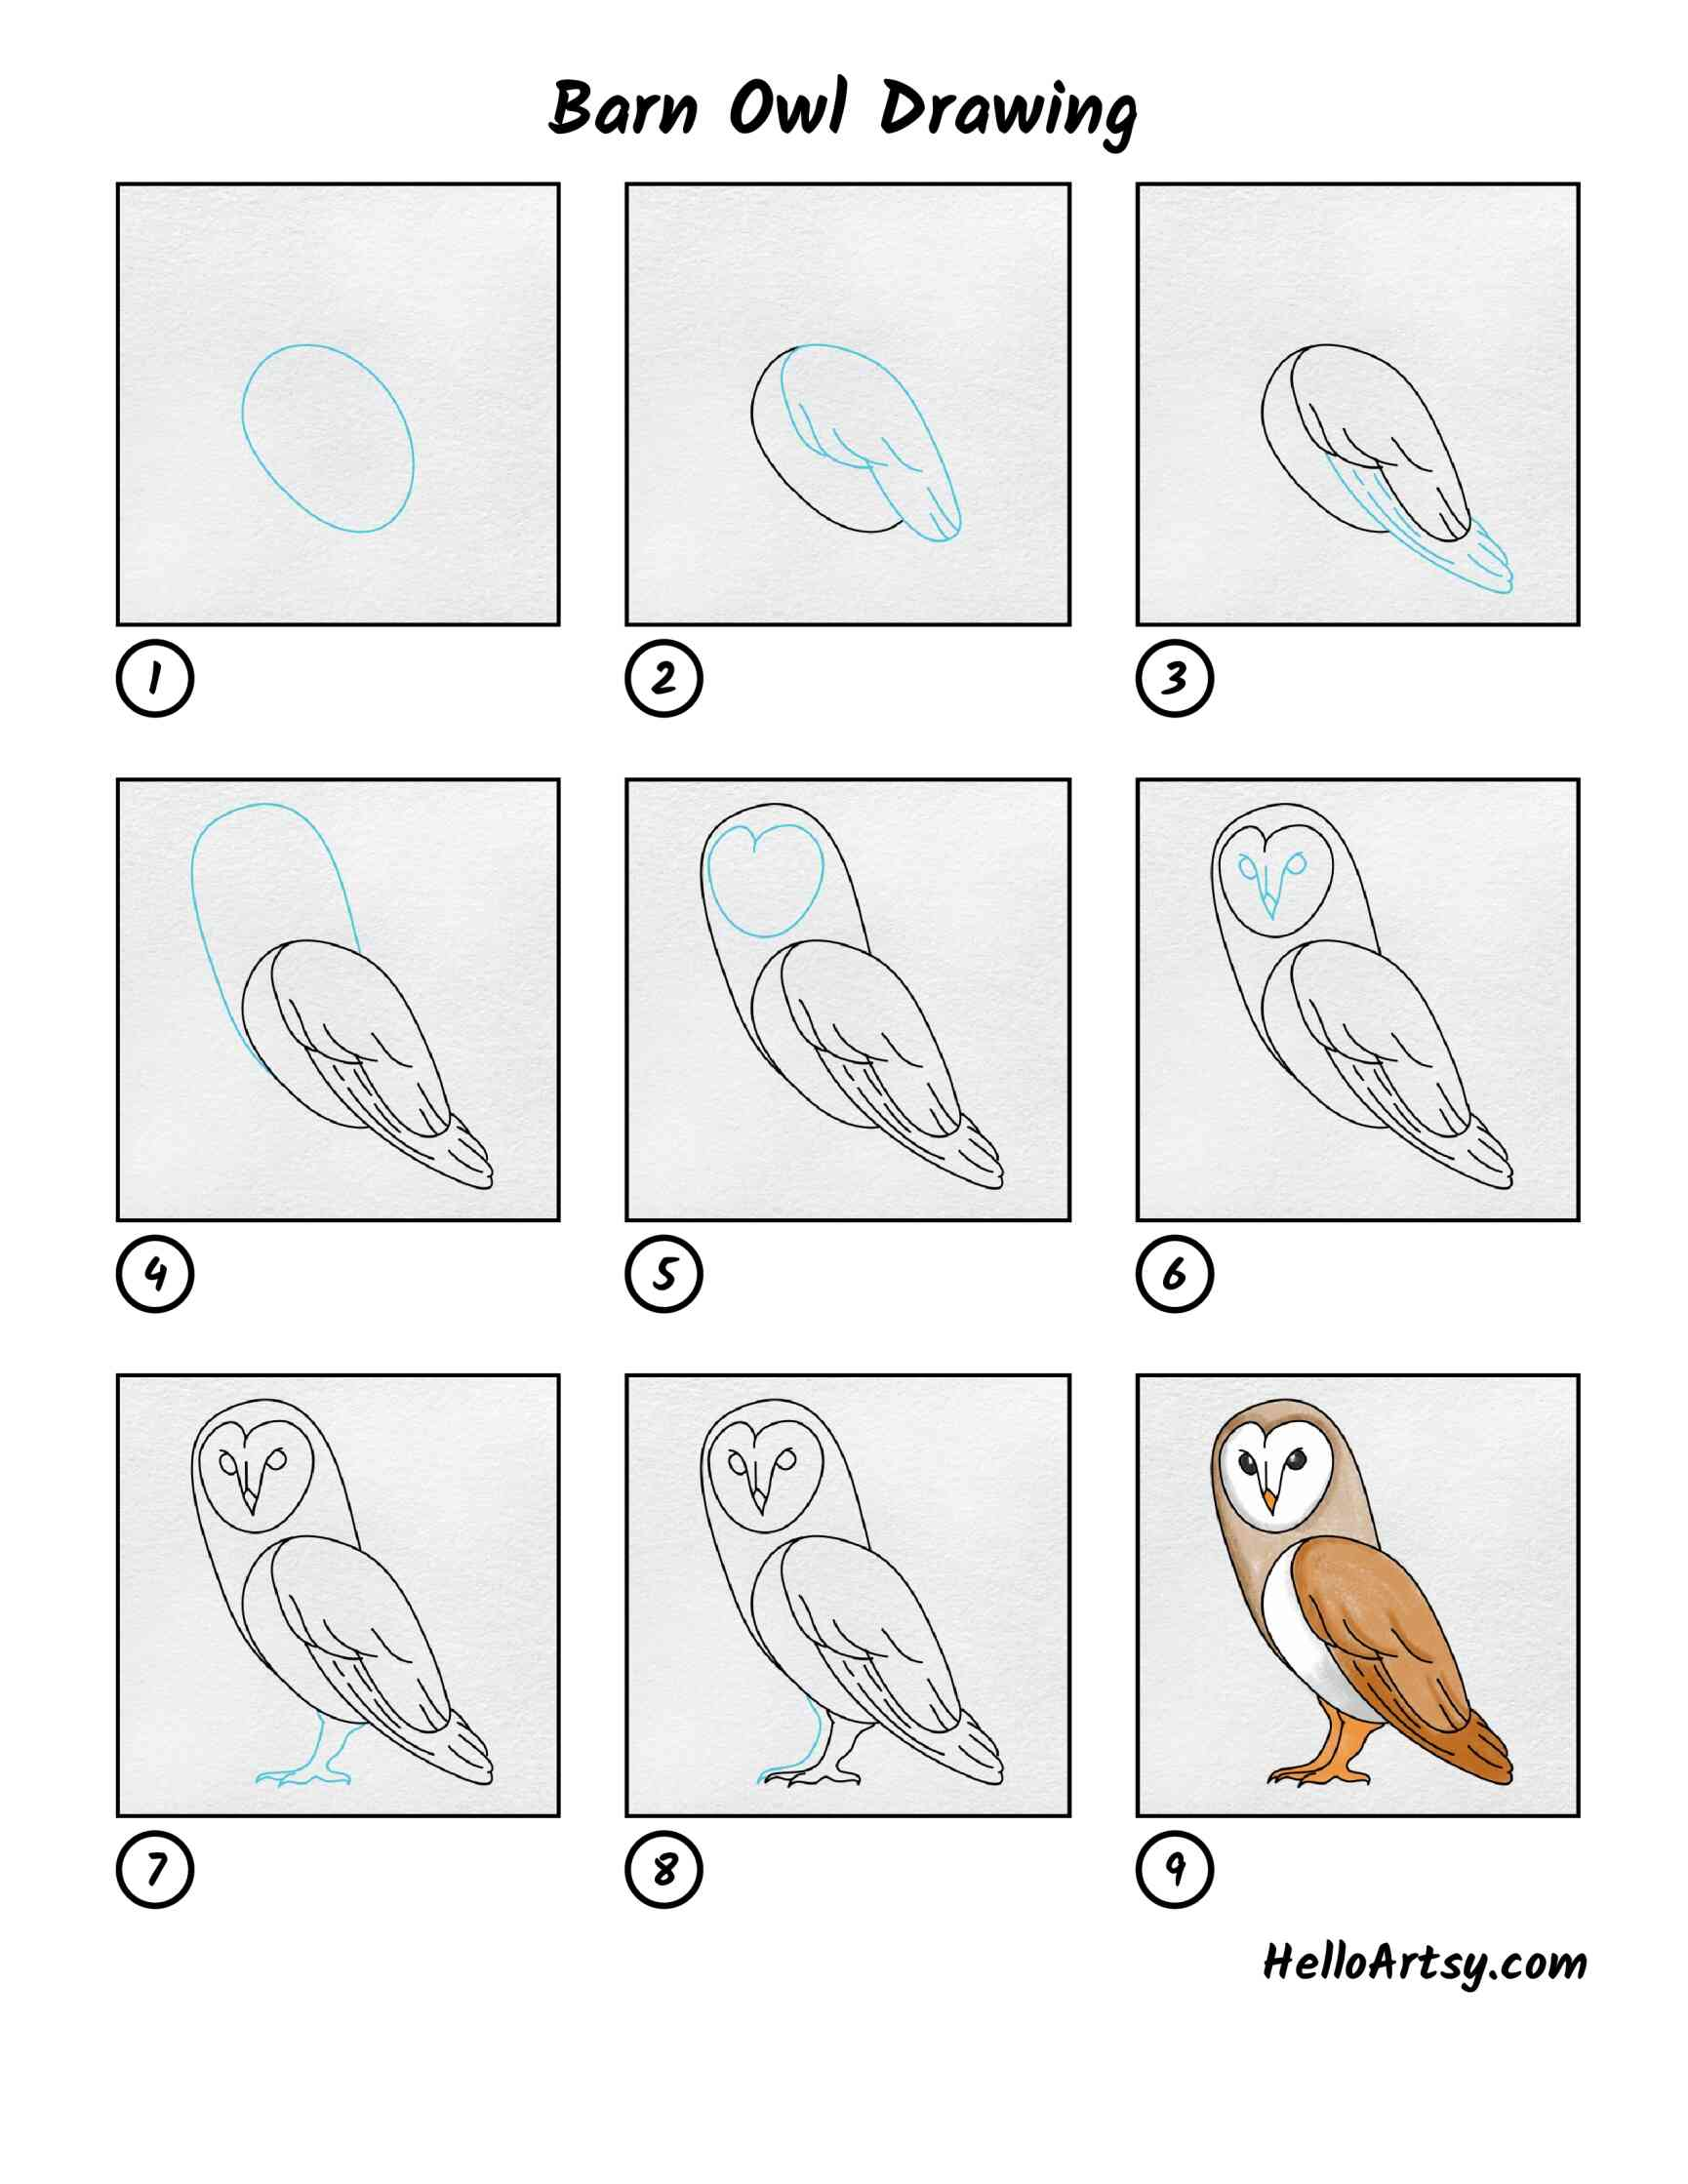 Barn Owl Drawing: All Steps